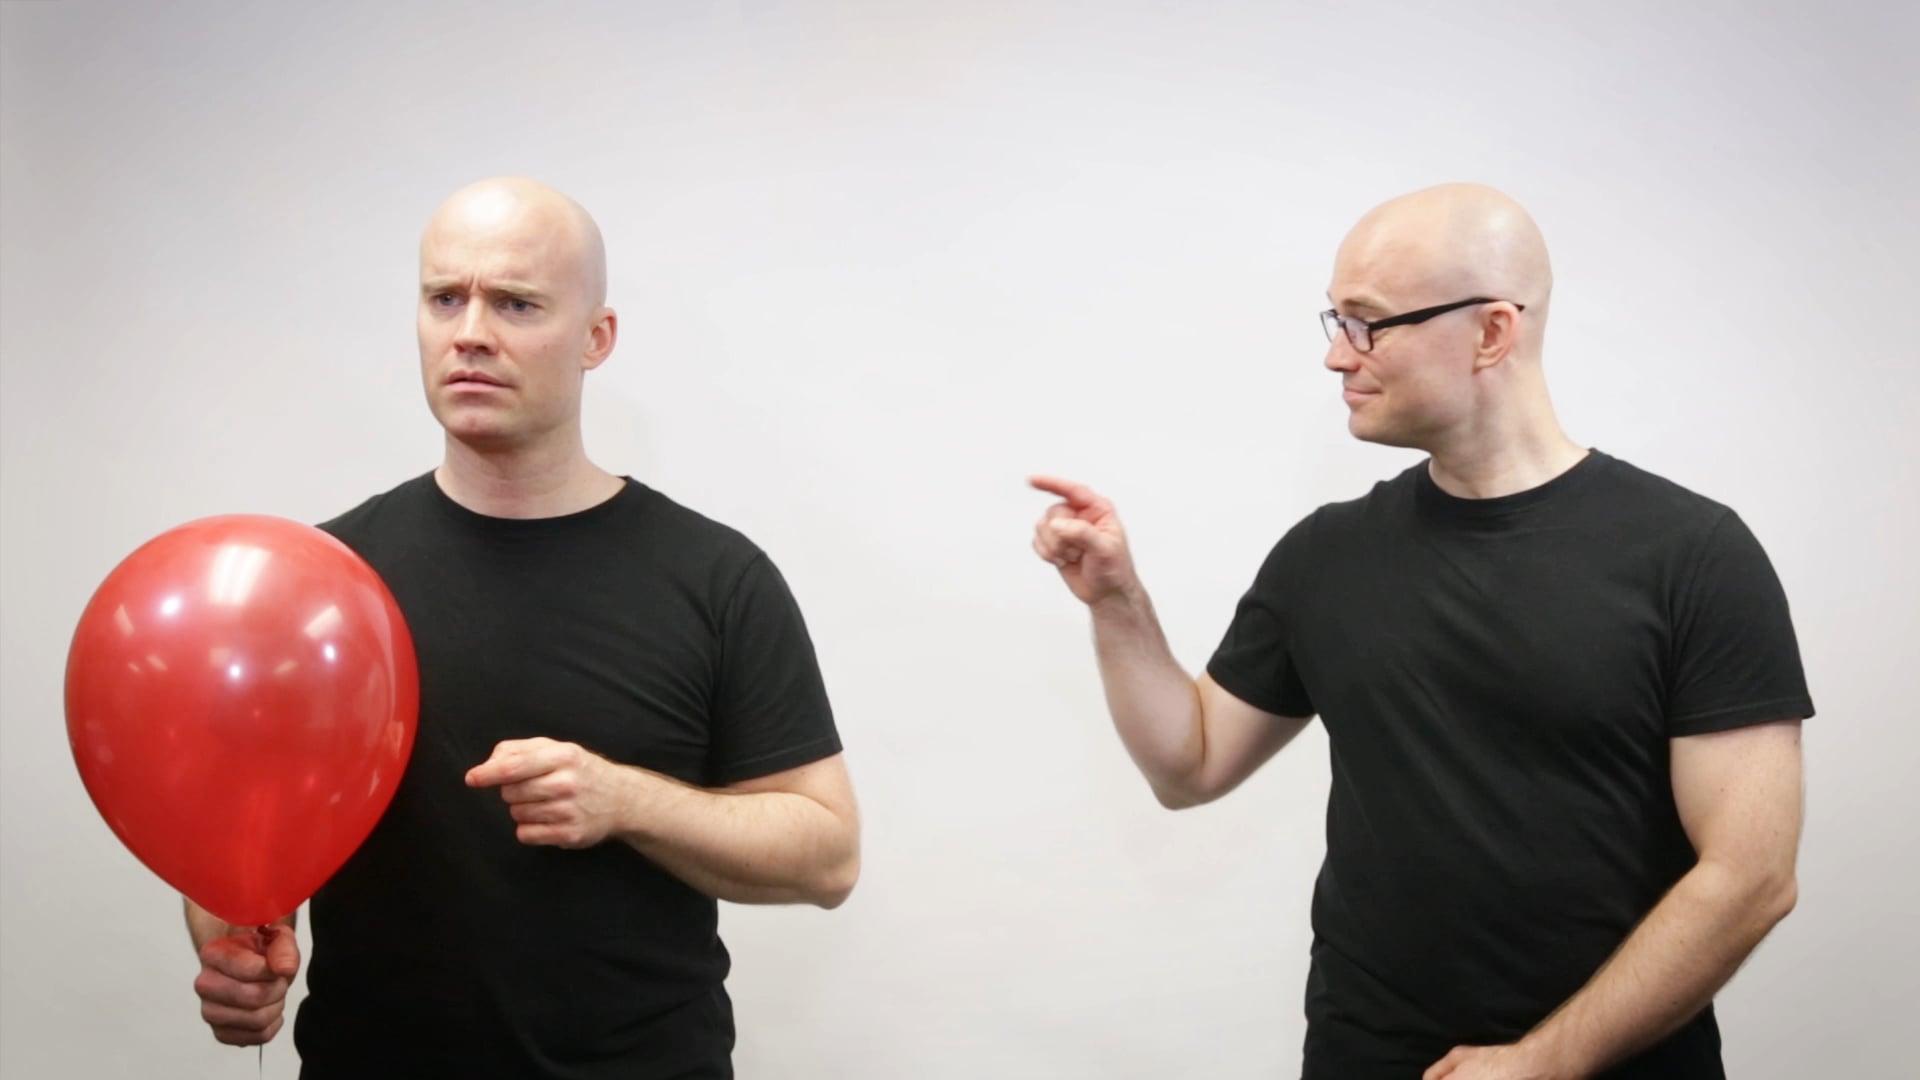 Doppelgänger Face-off: NVX Environmental Test